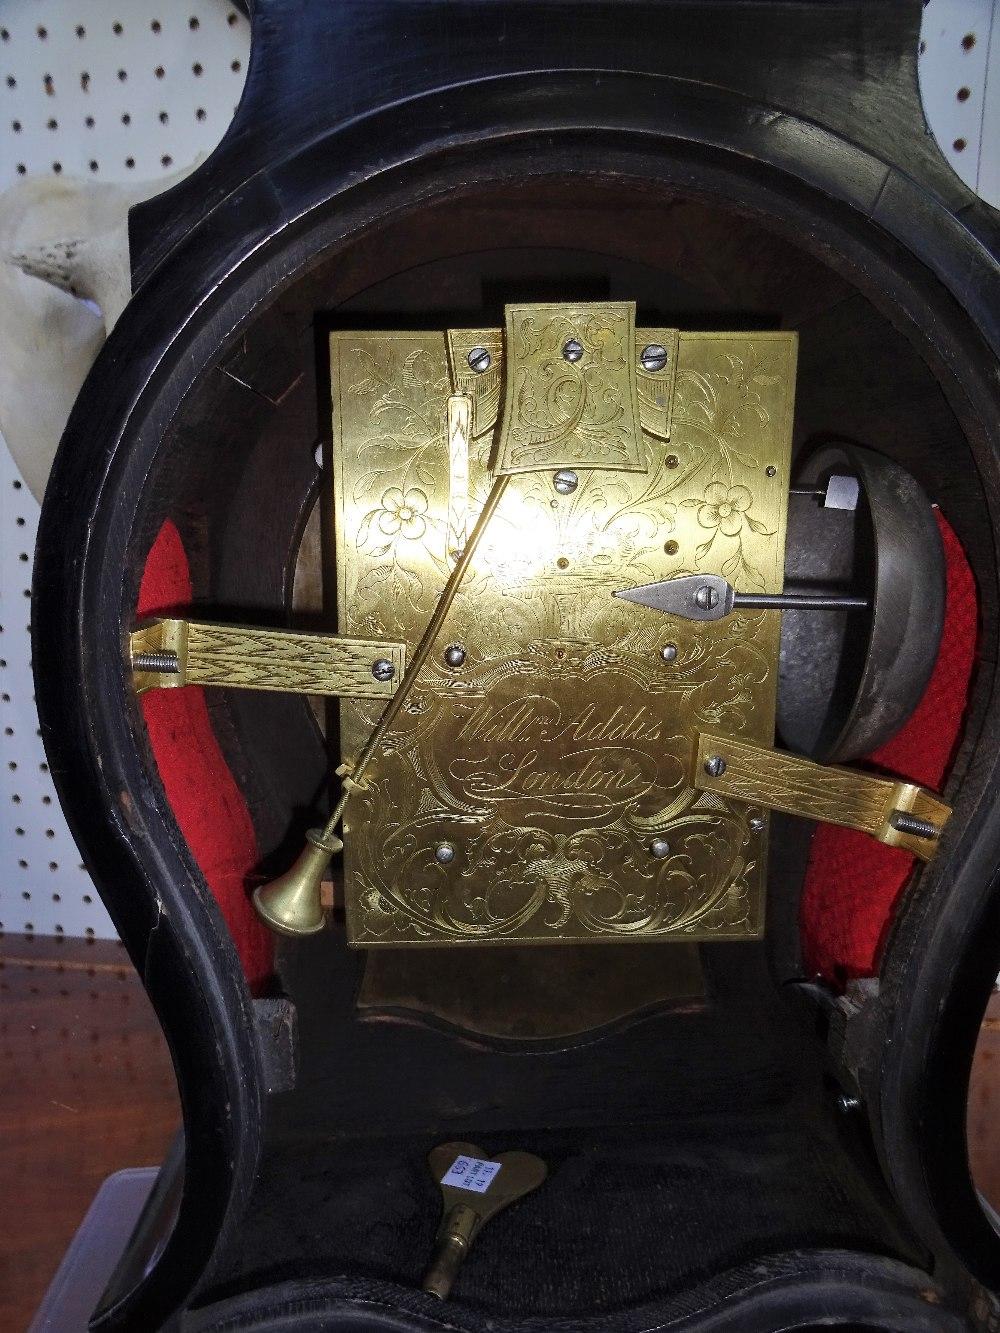 Lot 663 - A George III giltmetal-mounted ebonised striking balloon clock By William Addis,